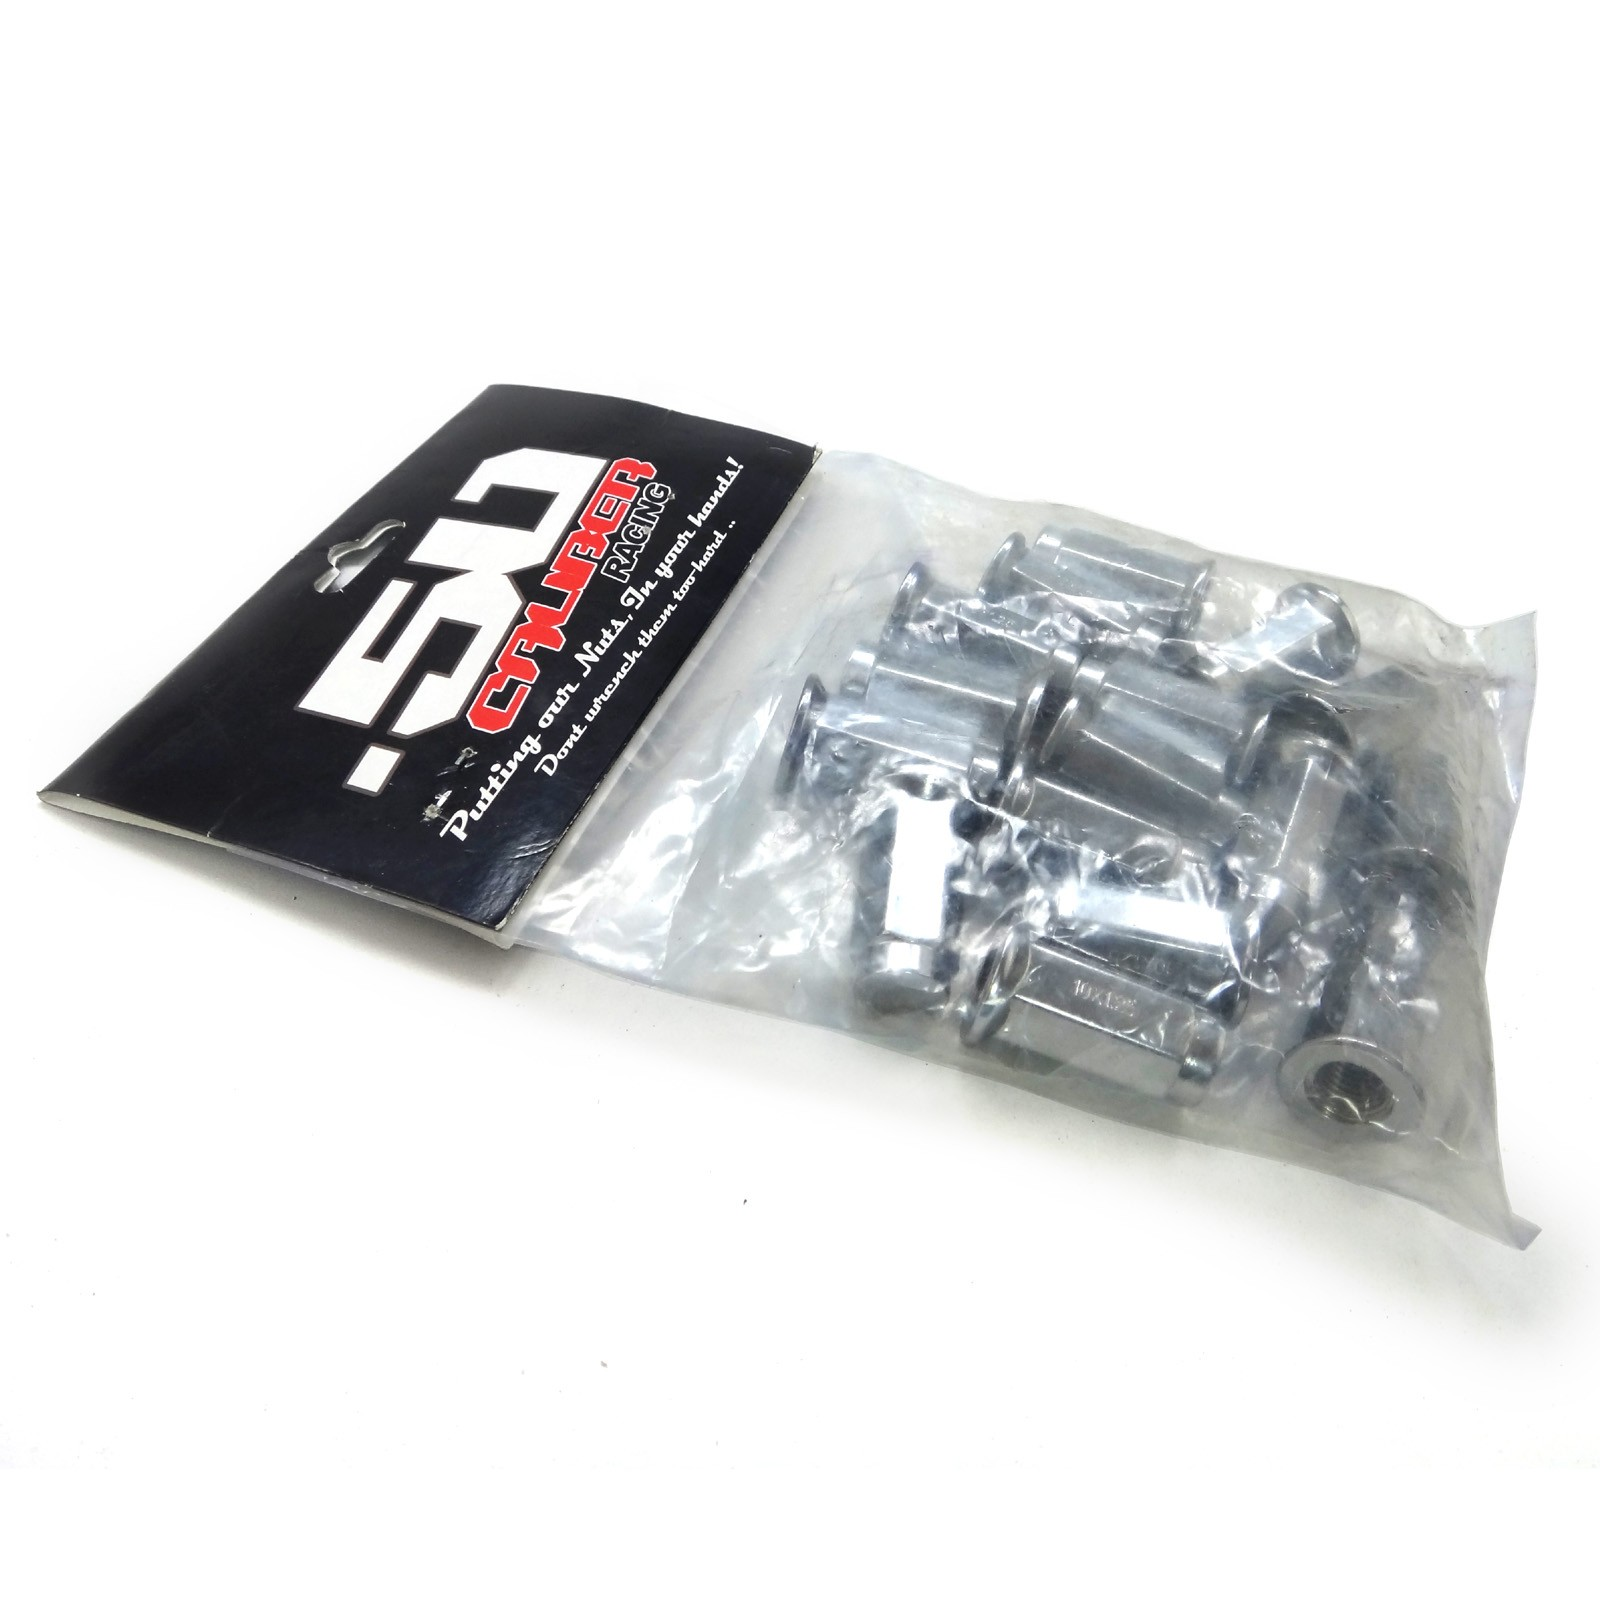 Lug Nut Set 16 Kawasaki Mule Teryx Alloy Steel Chrome Racing Flat Hex 12x1.25